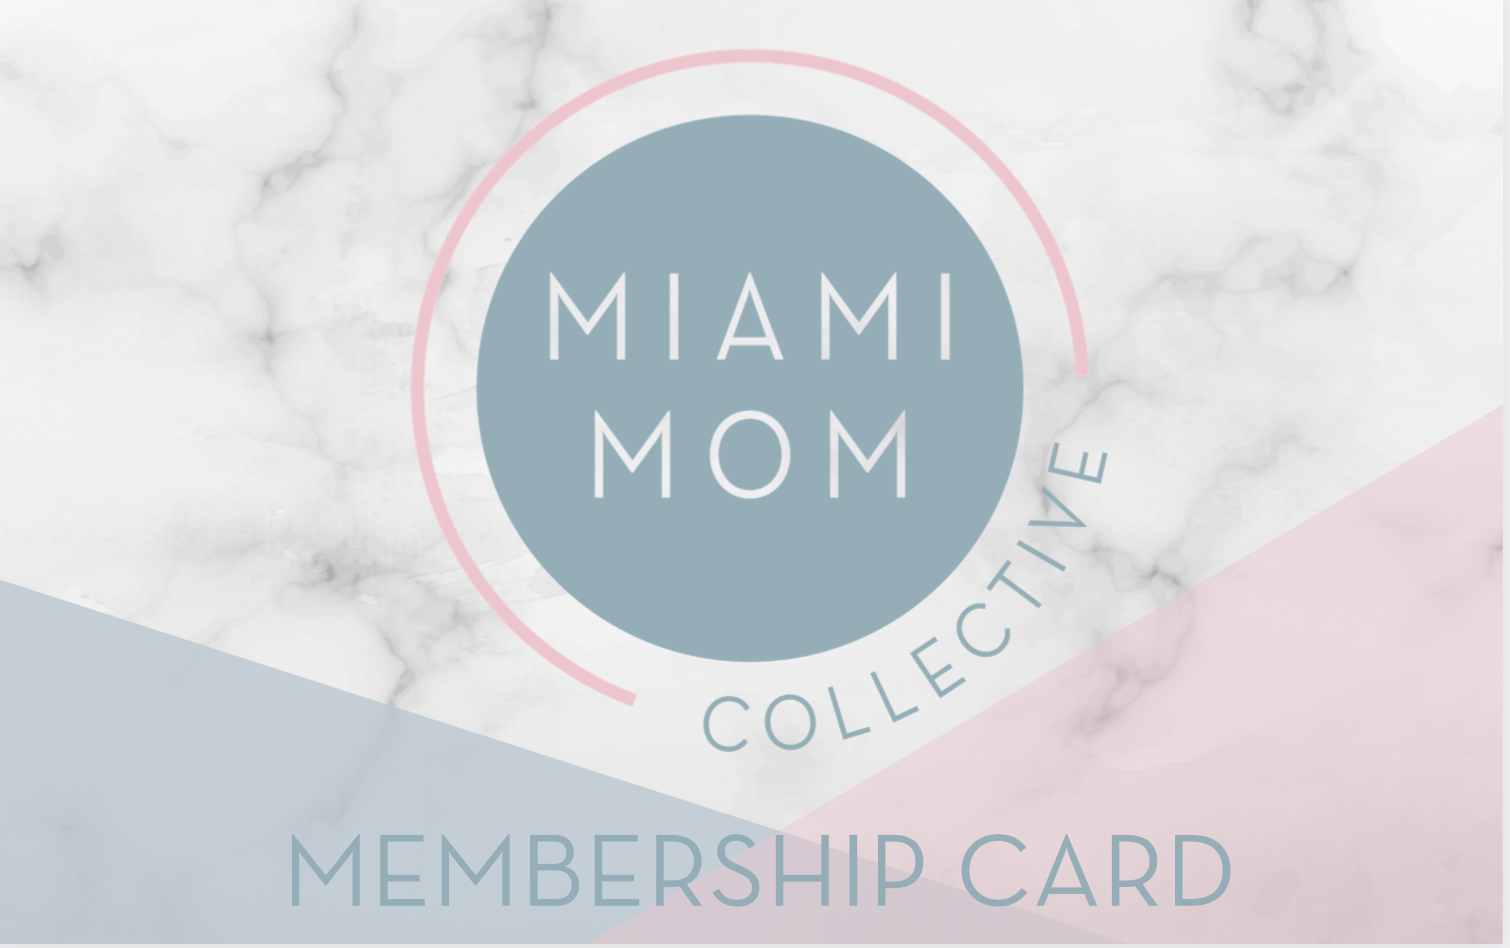 Miami Mom Collective Membership Card